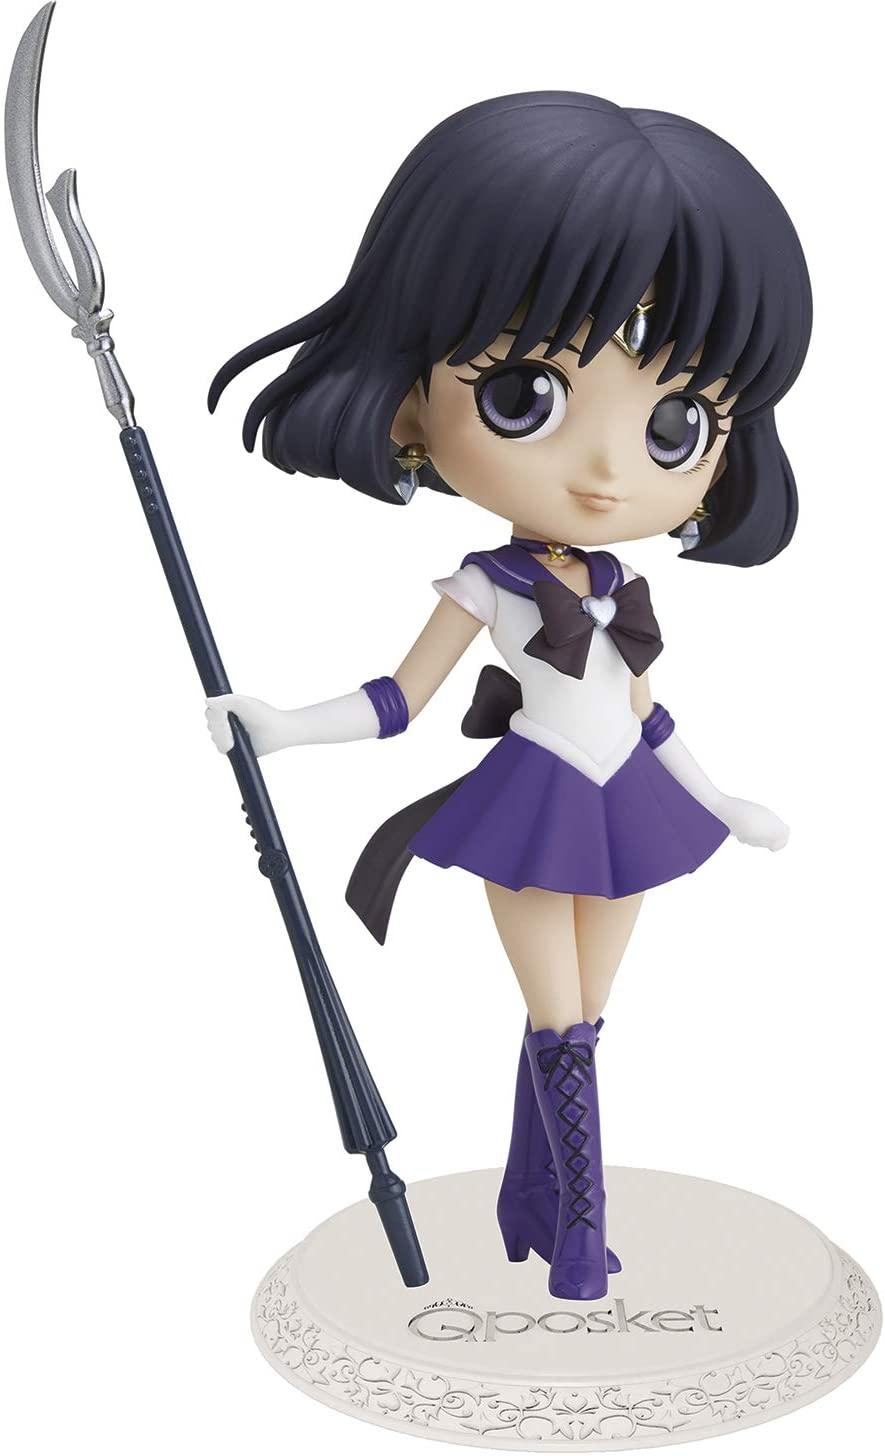 Sailor Saturn Figure, Q Posket, A Version, Sailor Moon, Banpresto